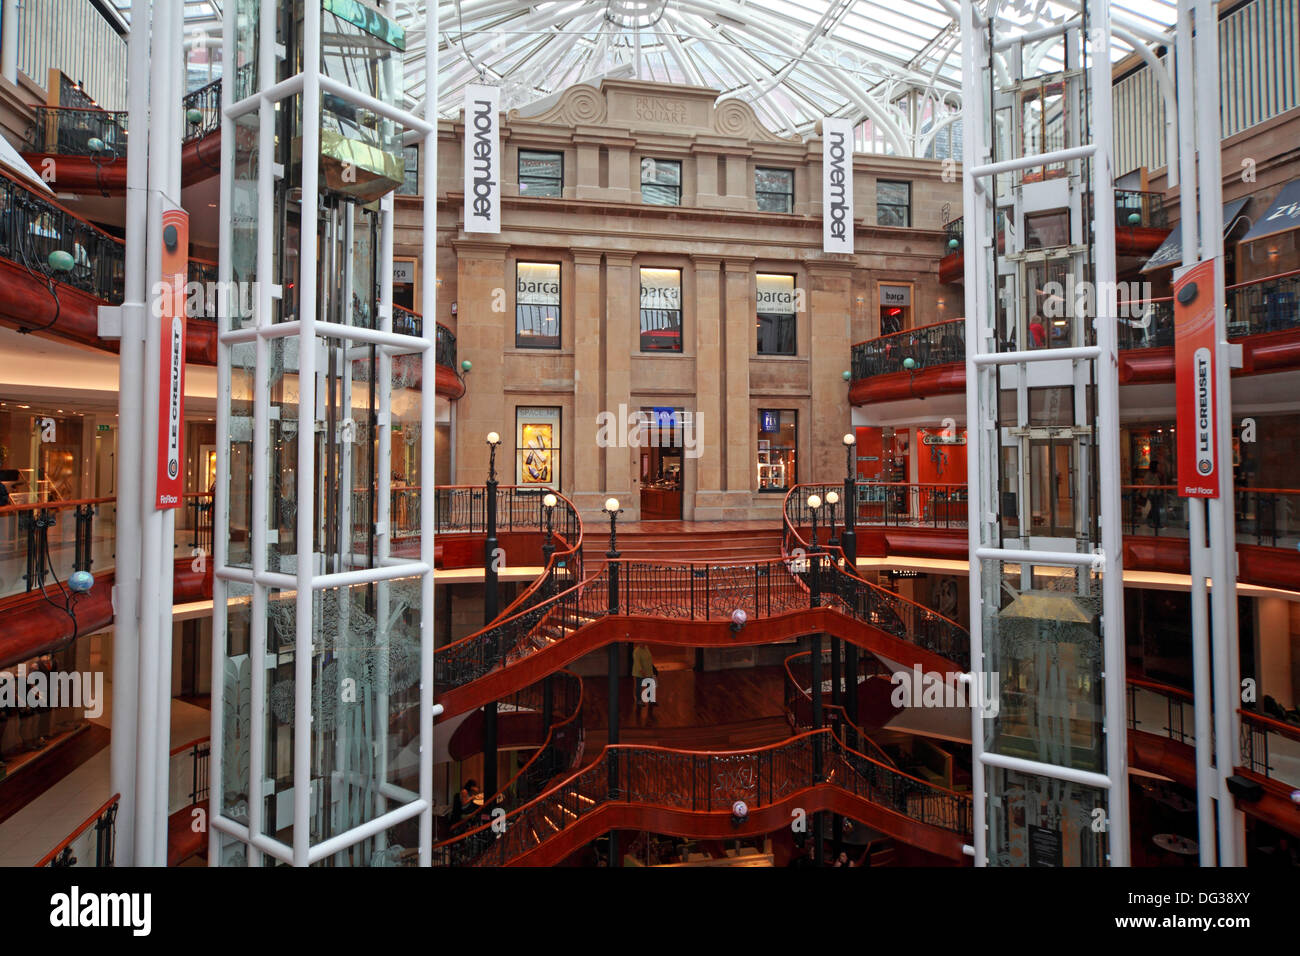 Princes Square Shopping Centre Interior Glasgow City Centre Strathclyde Scotland UK - Stock Image